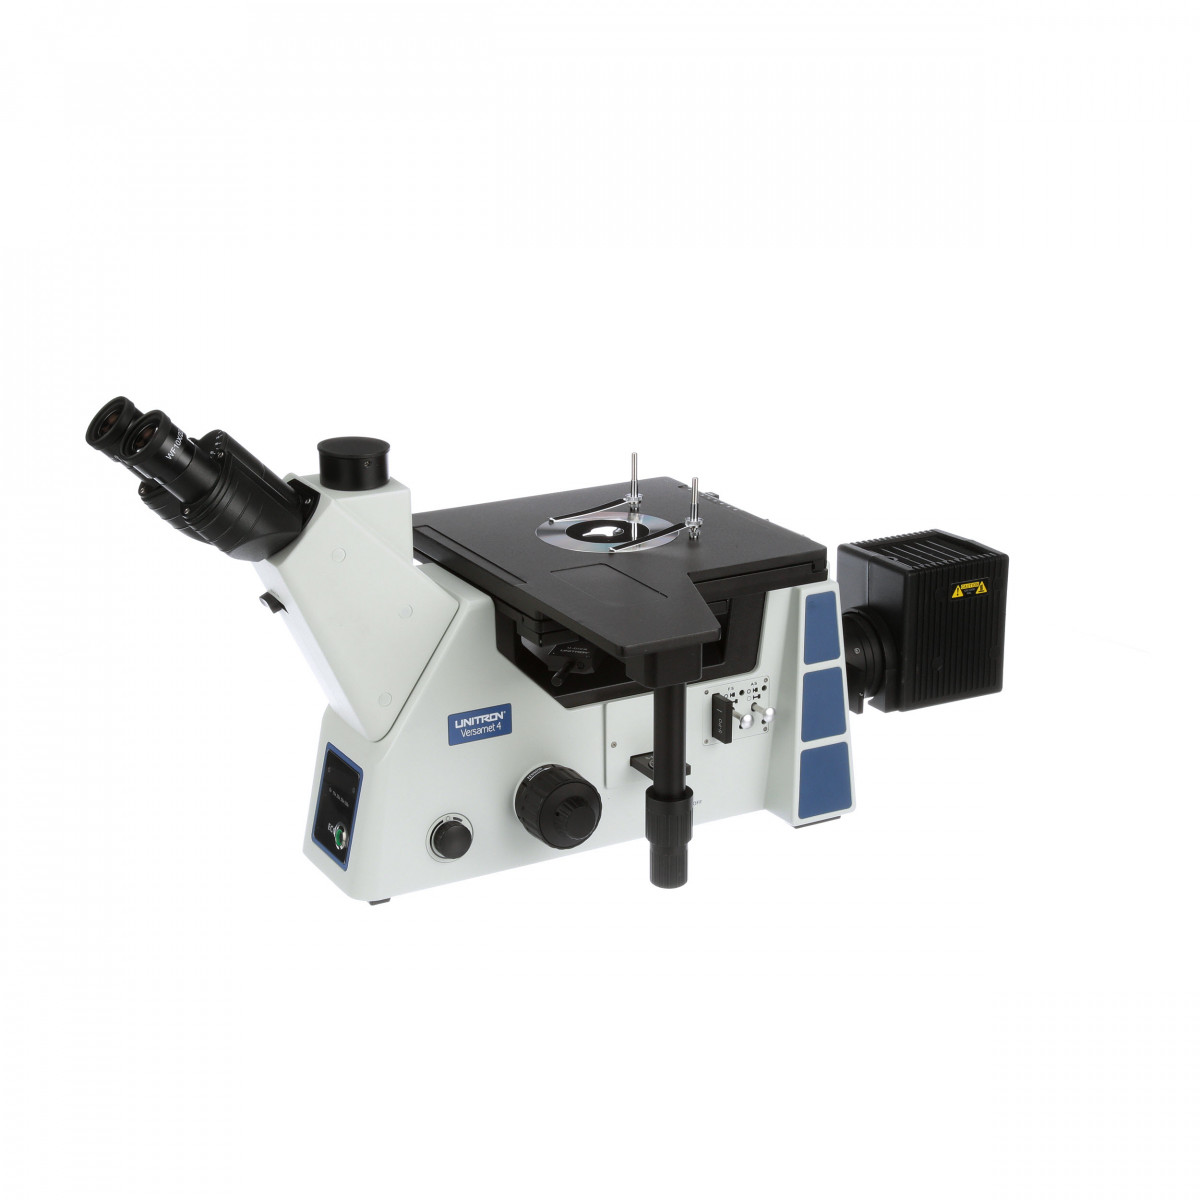 Versamet 4 Brightfield Metallurgical Microscope